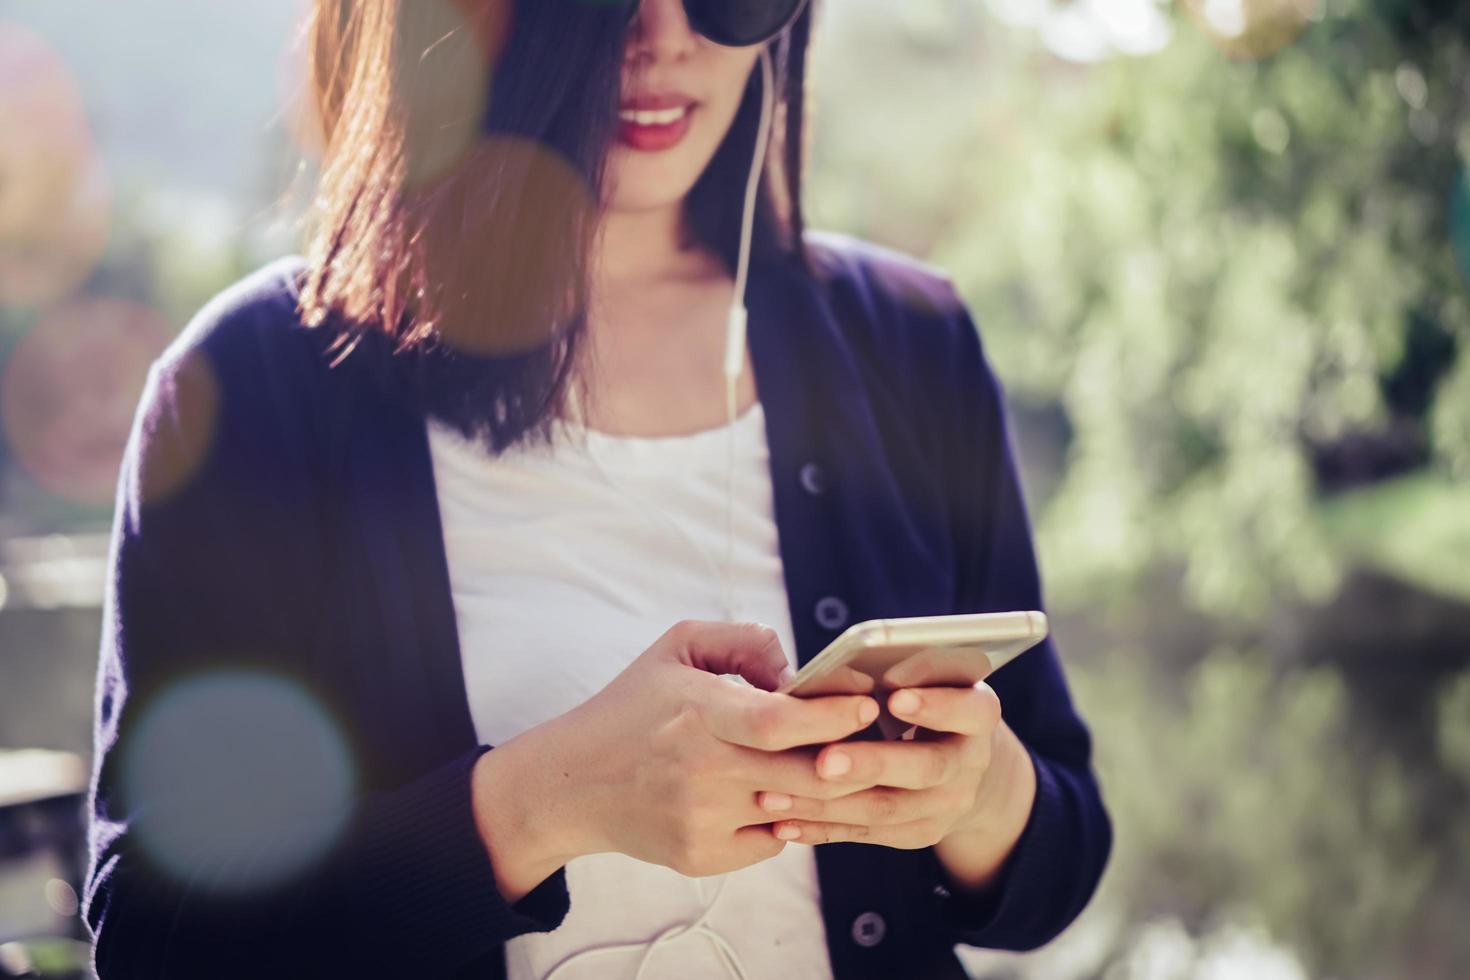 femme à l'aide de smartphone photo